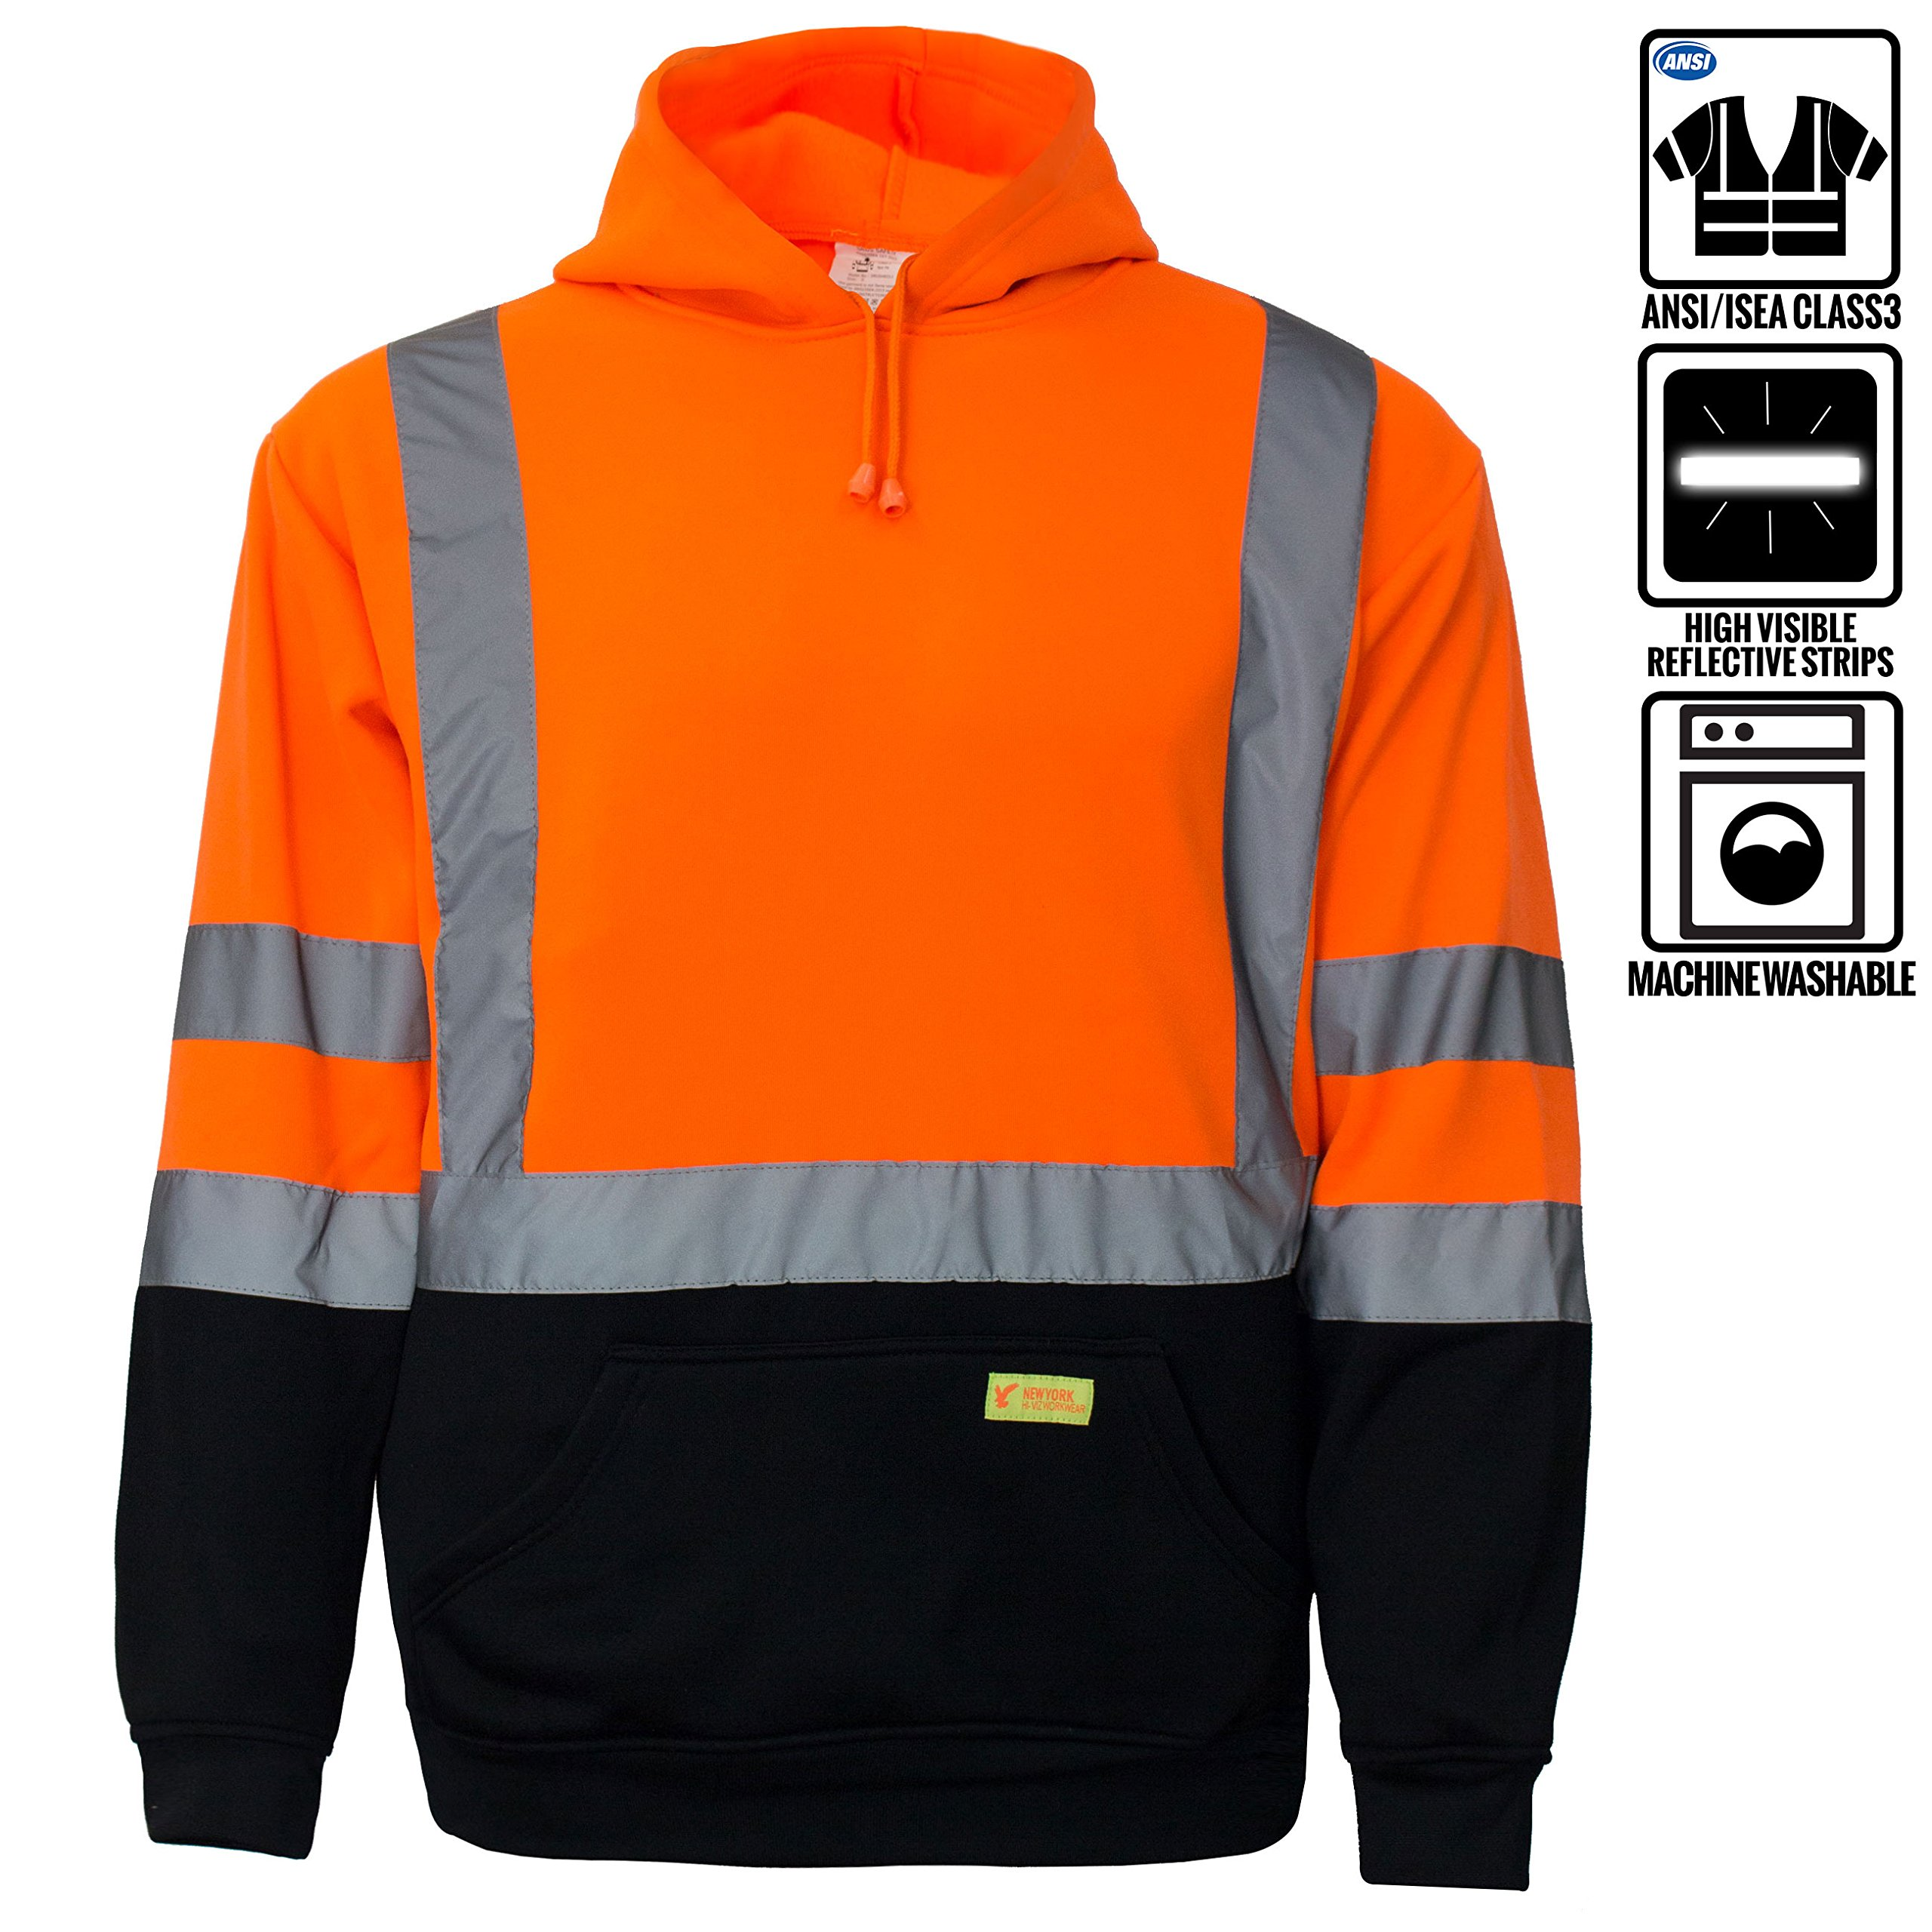 New York Hi-Viz Workwear H8311 Men's ANSI Class 3 High Visibility Class 3 Sweatshirt, Hooded Pullover, Knit Lining, Black Bottom (Orange, Large)